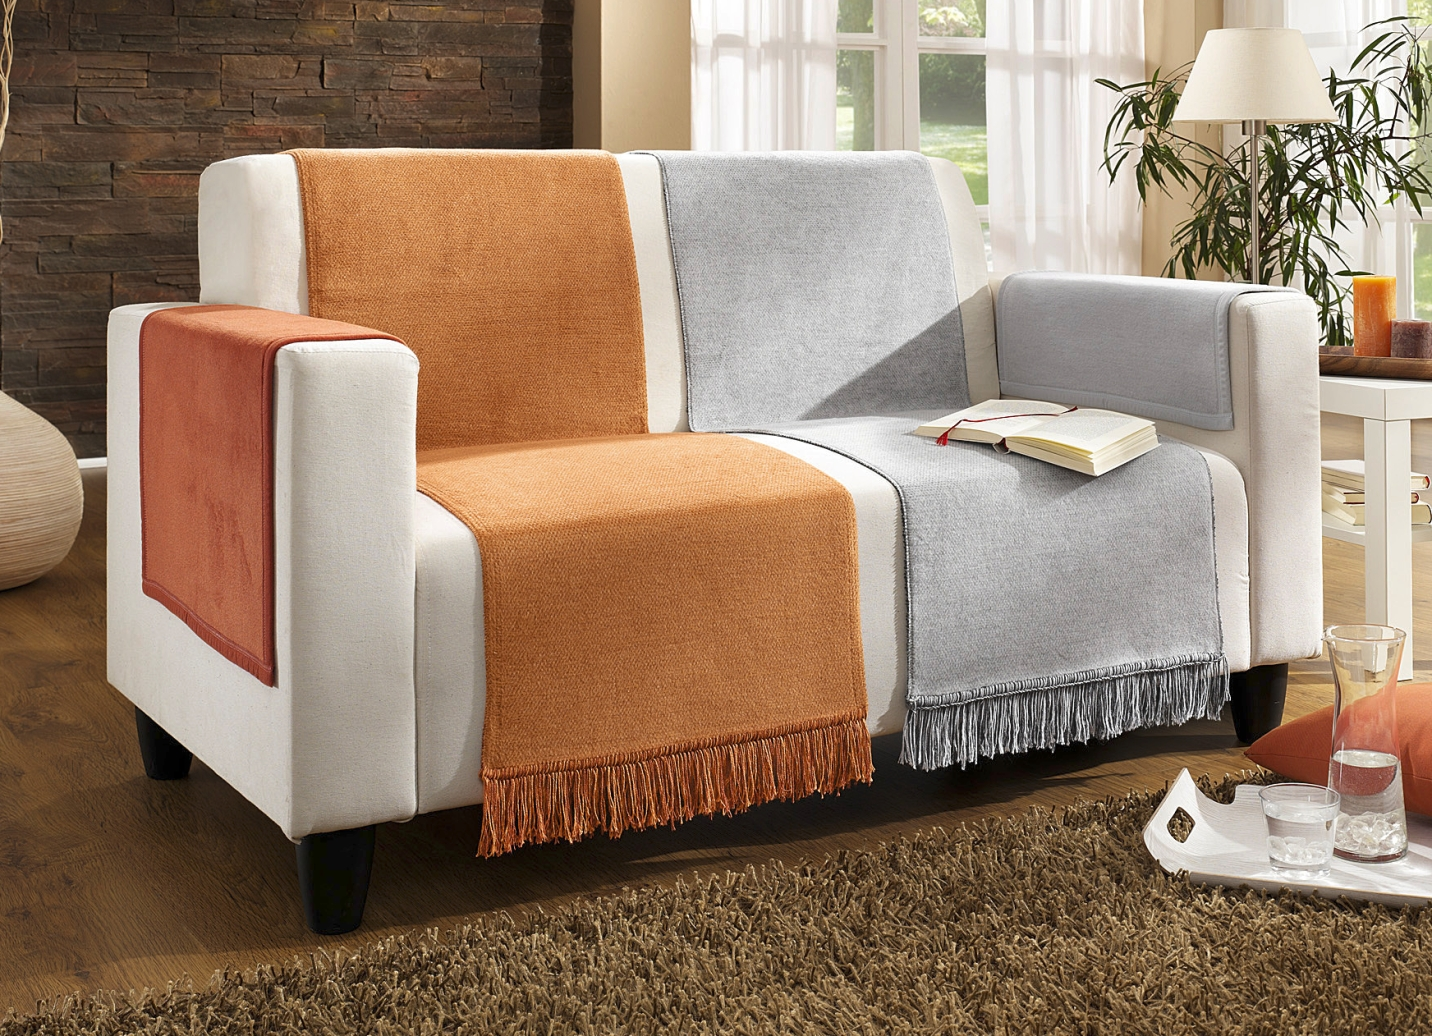 bocasa wohnaccessoires verschiedene farben sessel. Black Bedroom Furniture Sets. Home Design Ideas